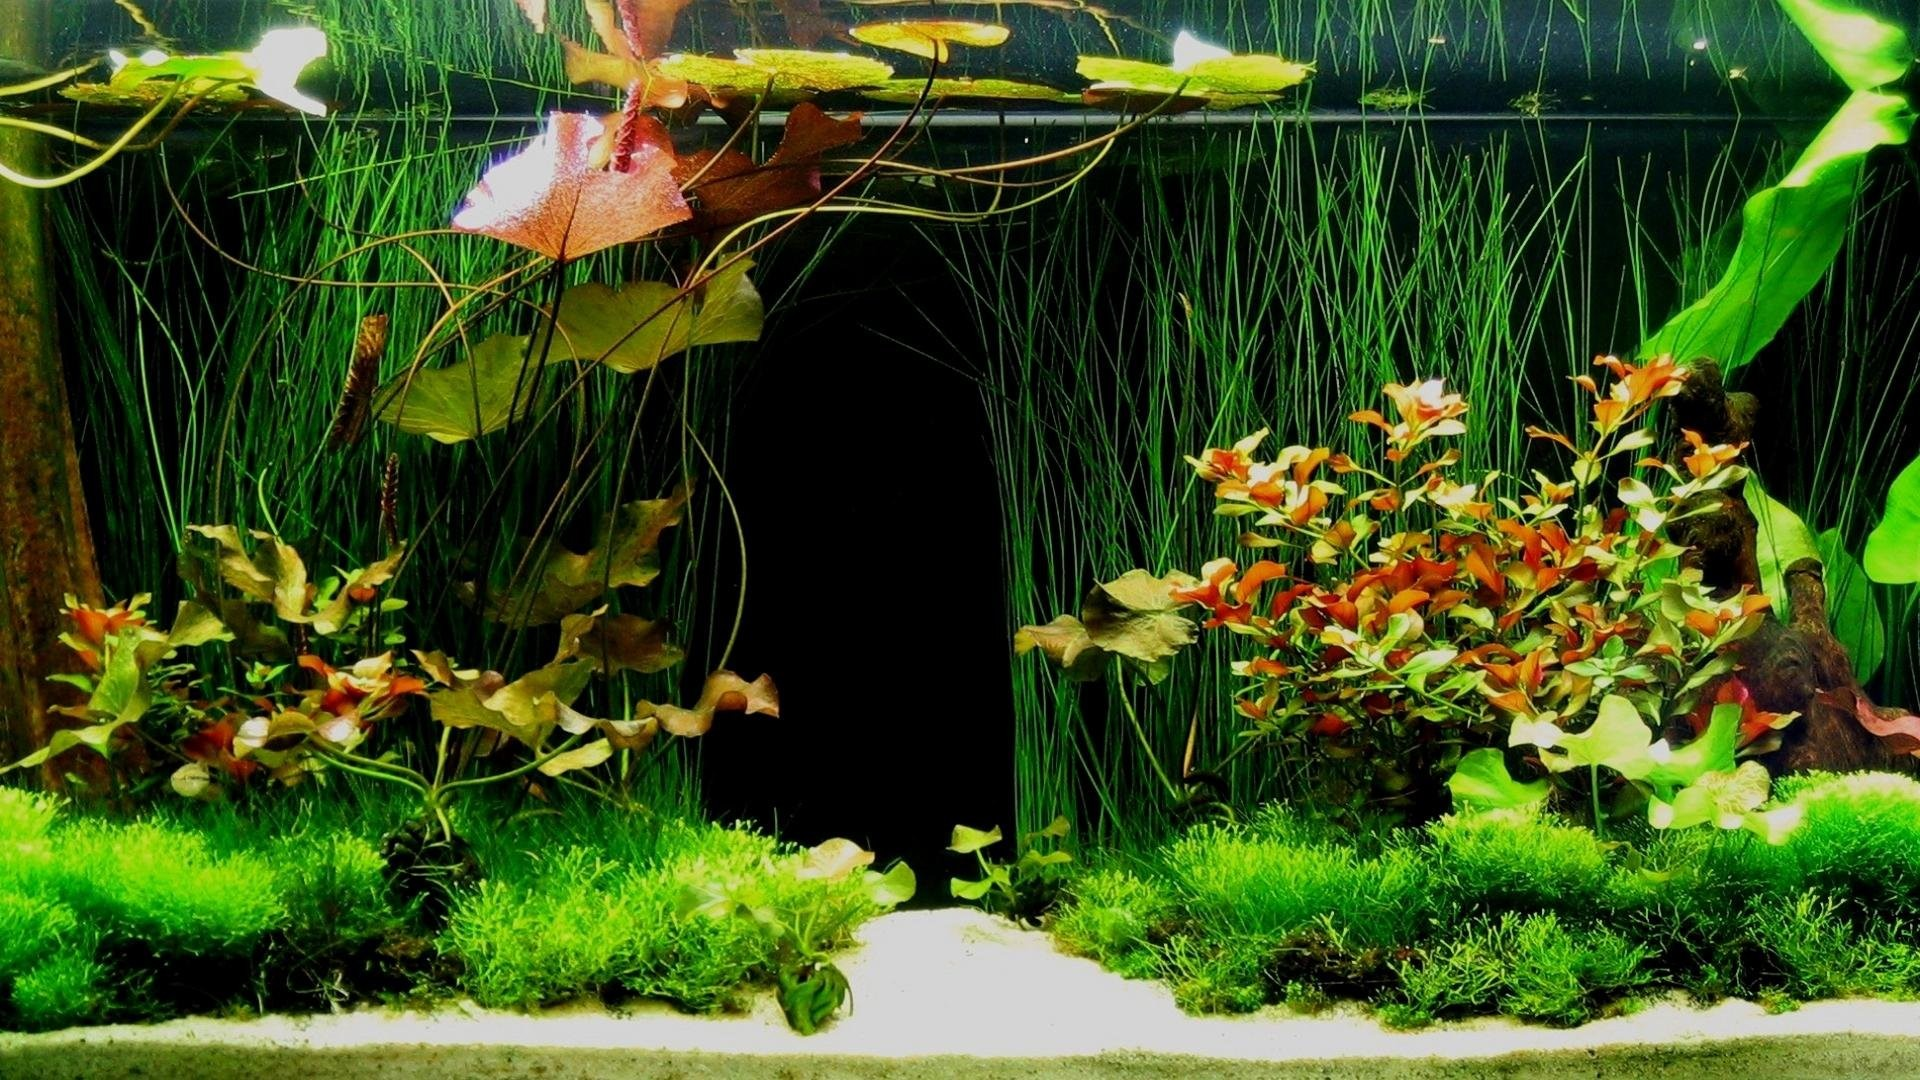 Aquarium Screensaver Free Download For Android : Beautiful aquarium  wallpaper 360725 walldevil